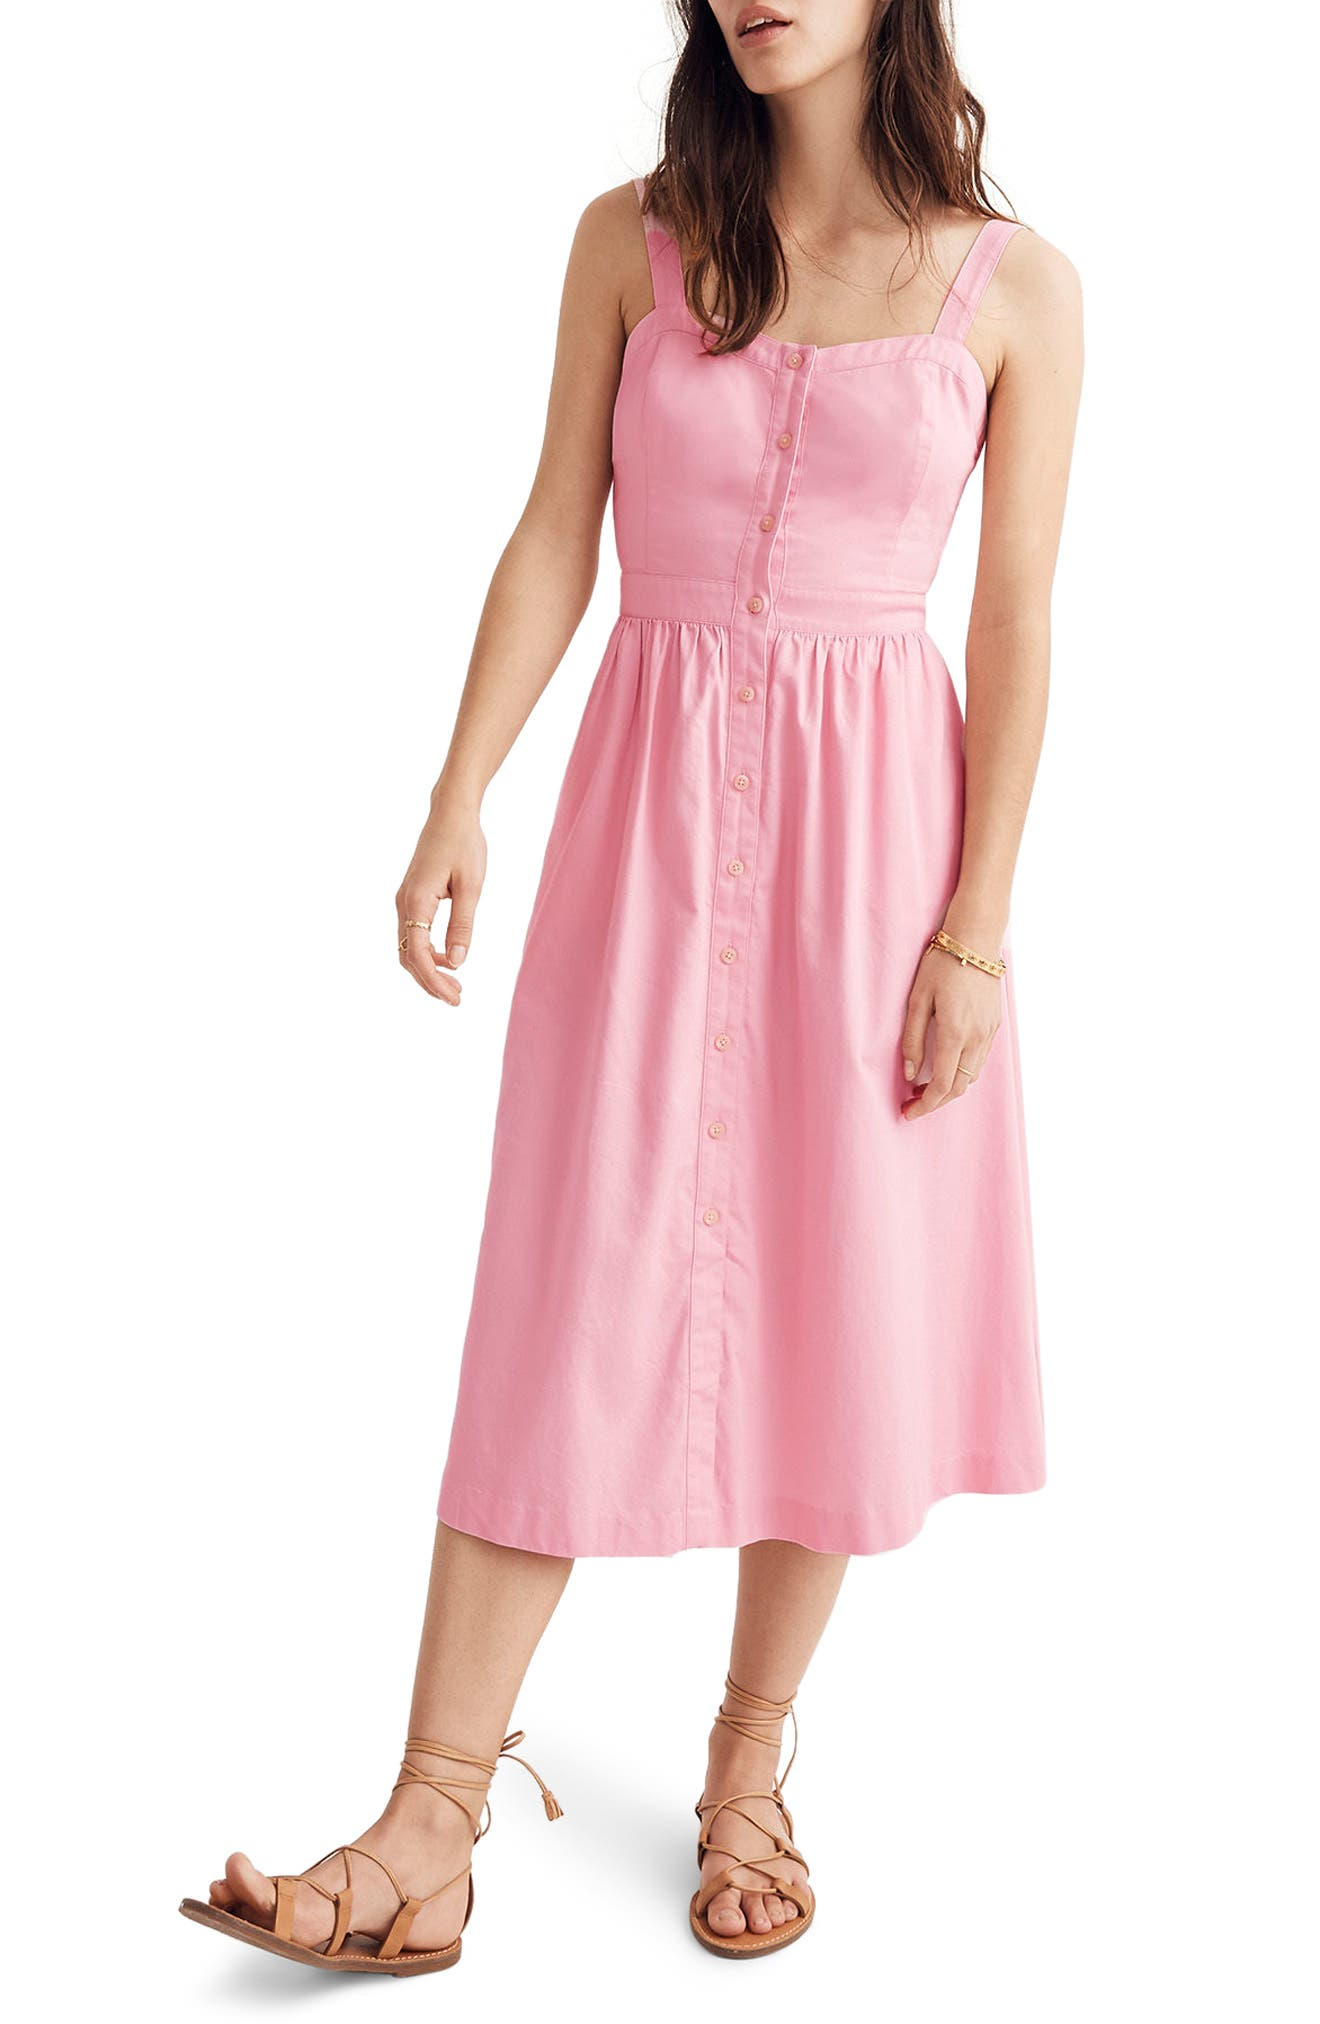 Alternate Image 1 Selected - Madewell Pink Fleur Bow Back Dress